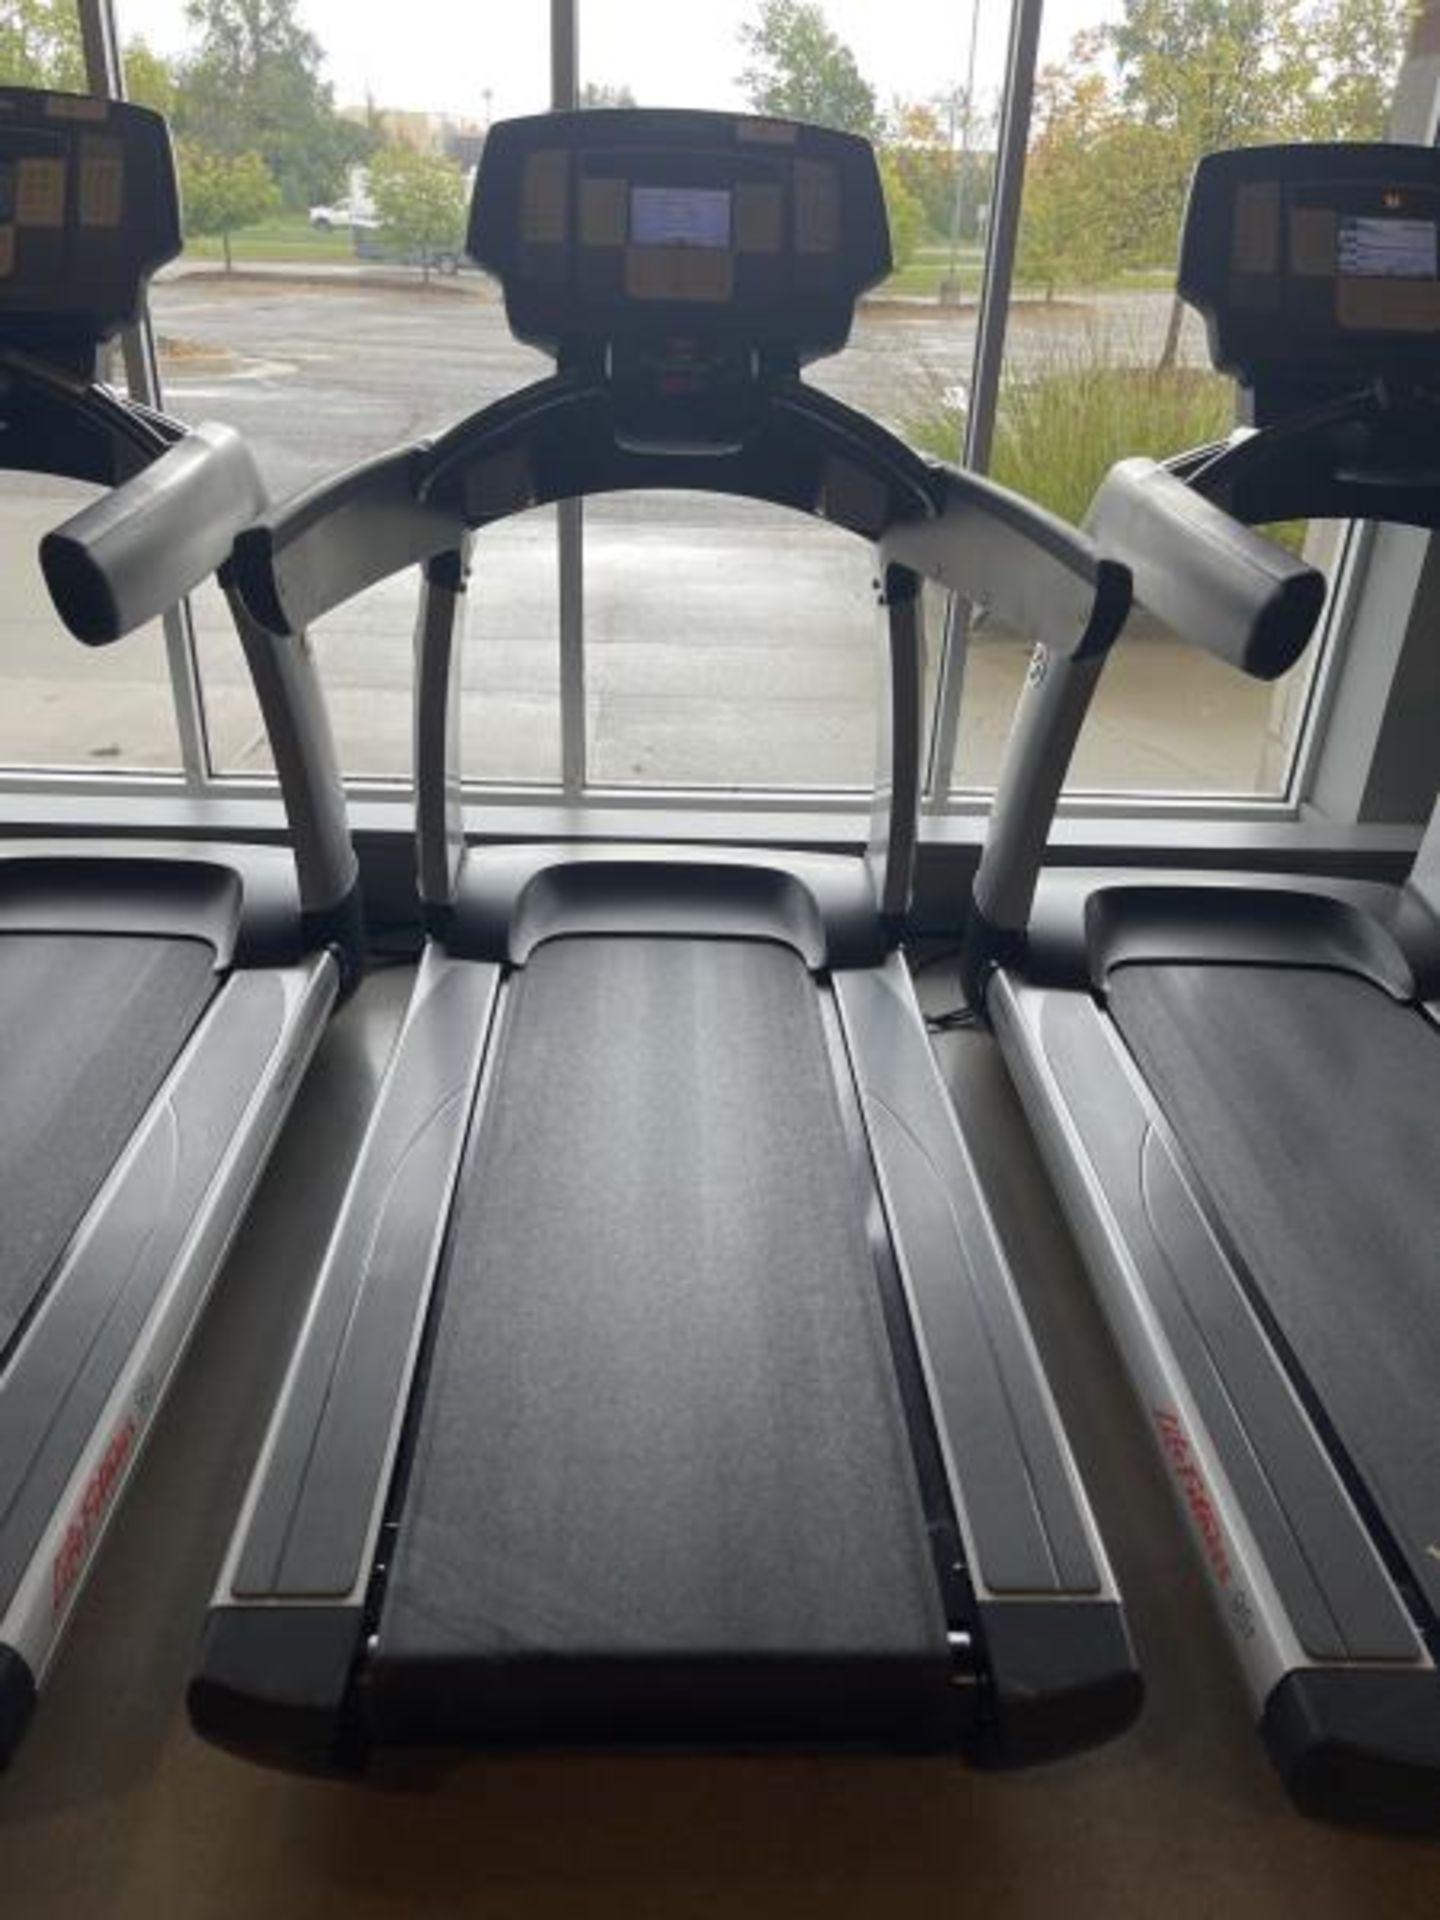 Life Fitness Treadmill M: 95T with Flex Deck, Shock Absorption System SN: TET108411